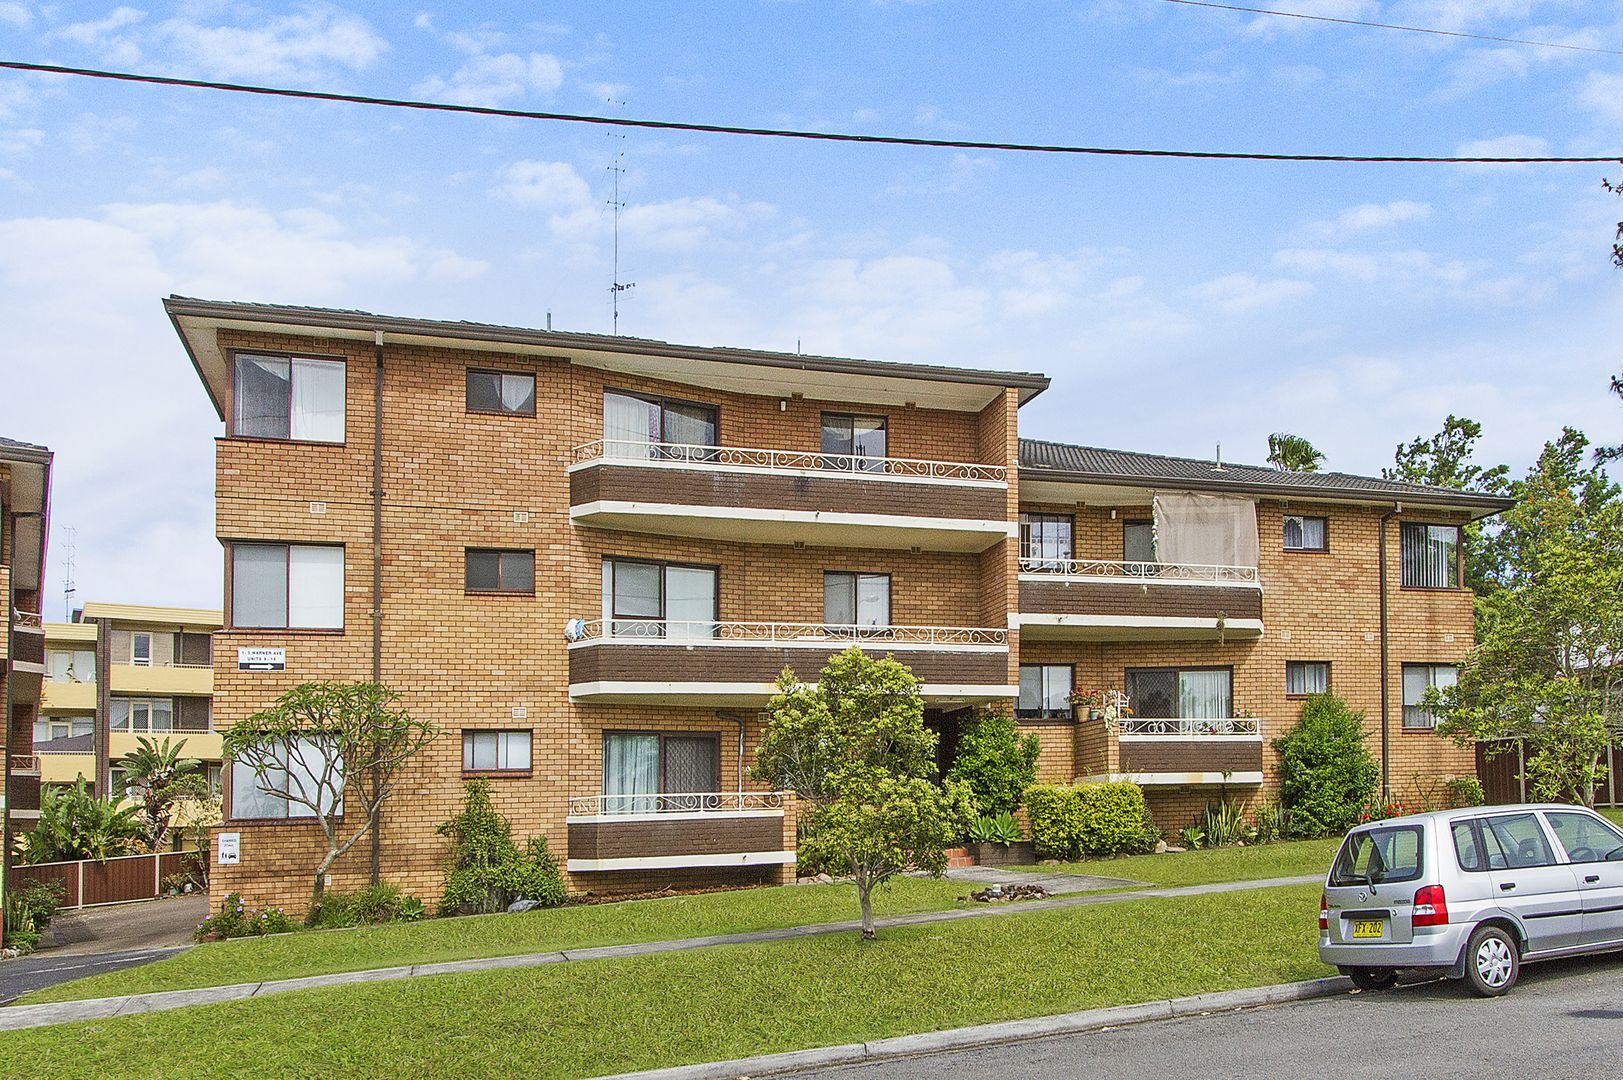 12/1-3 Warner Avenue, Wyong NSW 2259, Image 0